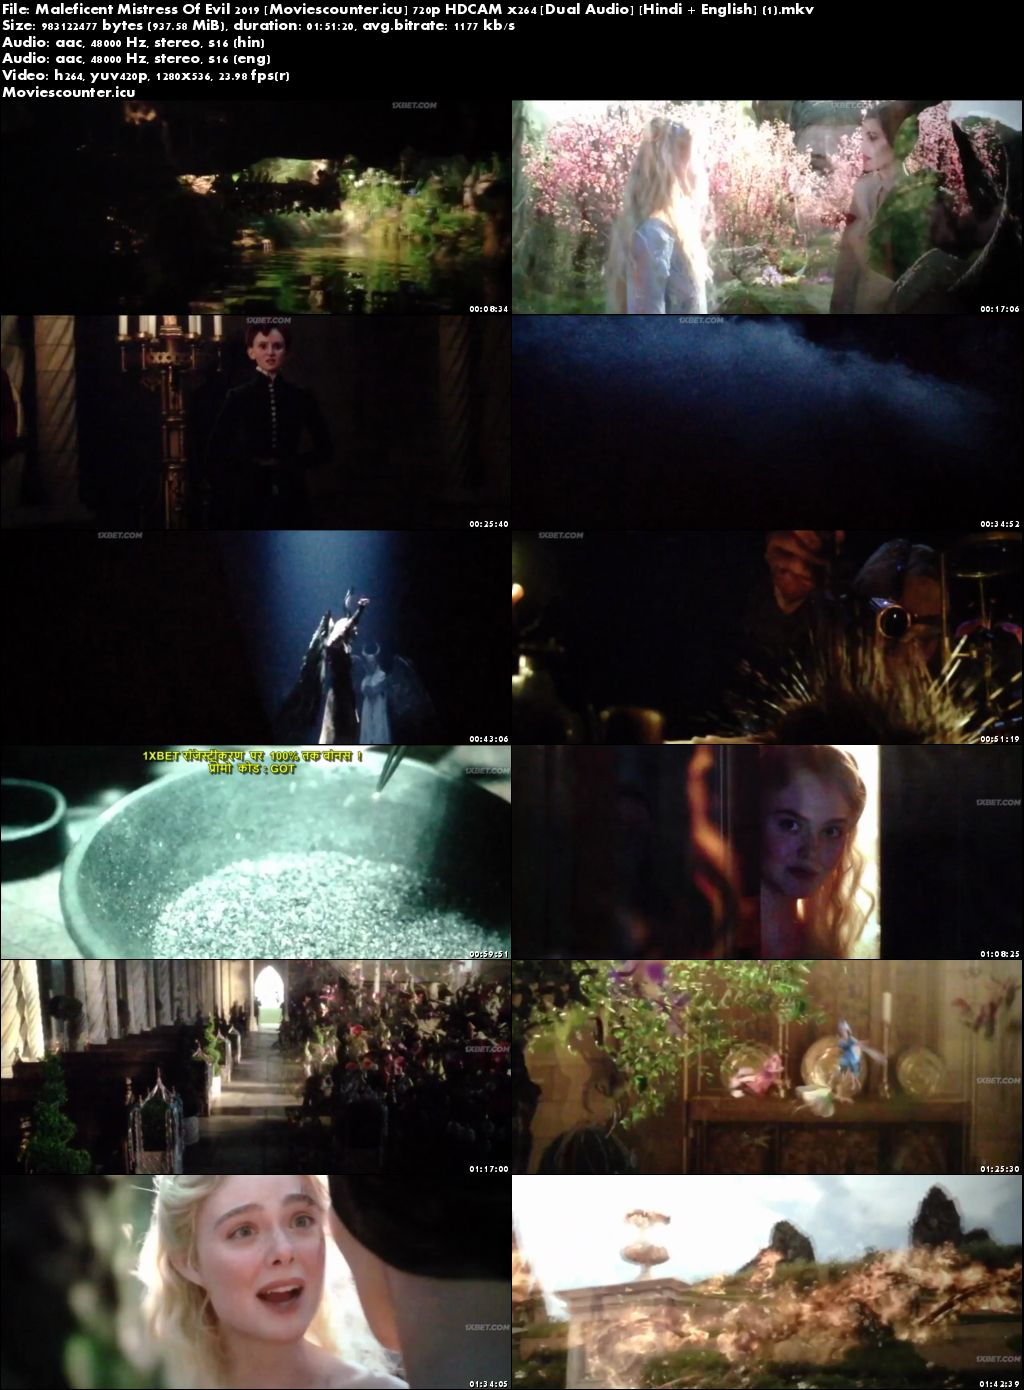 Screen Shots Maleficent: Mistress of Evil 2019